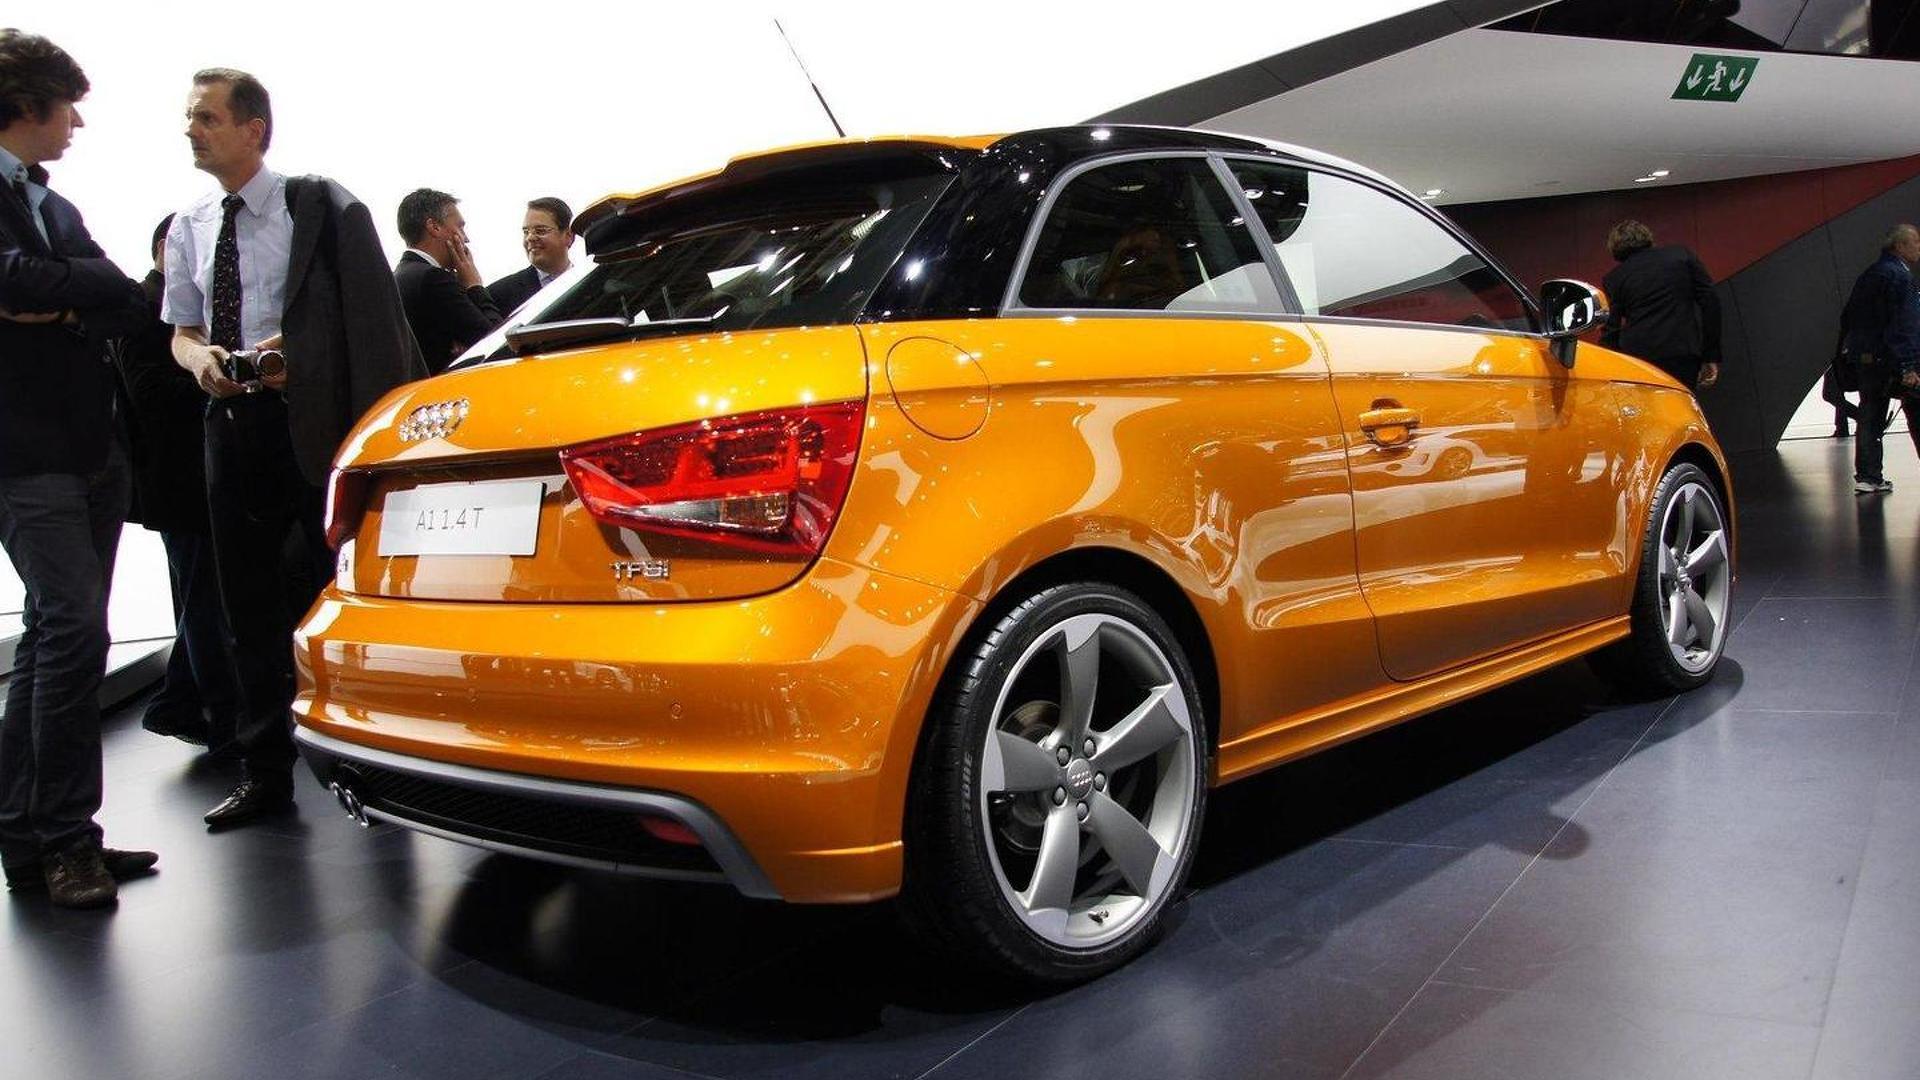 Audi unveils A1 1.4 TFSI in Paris